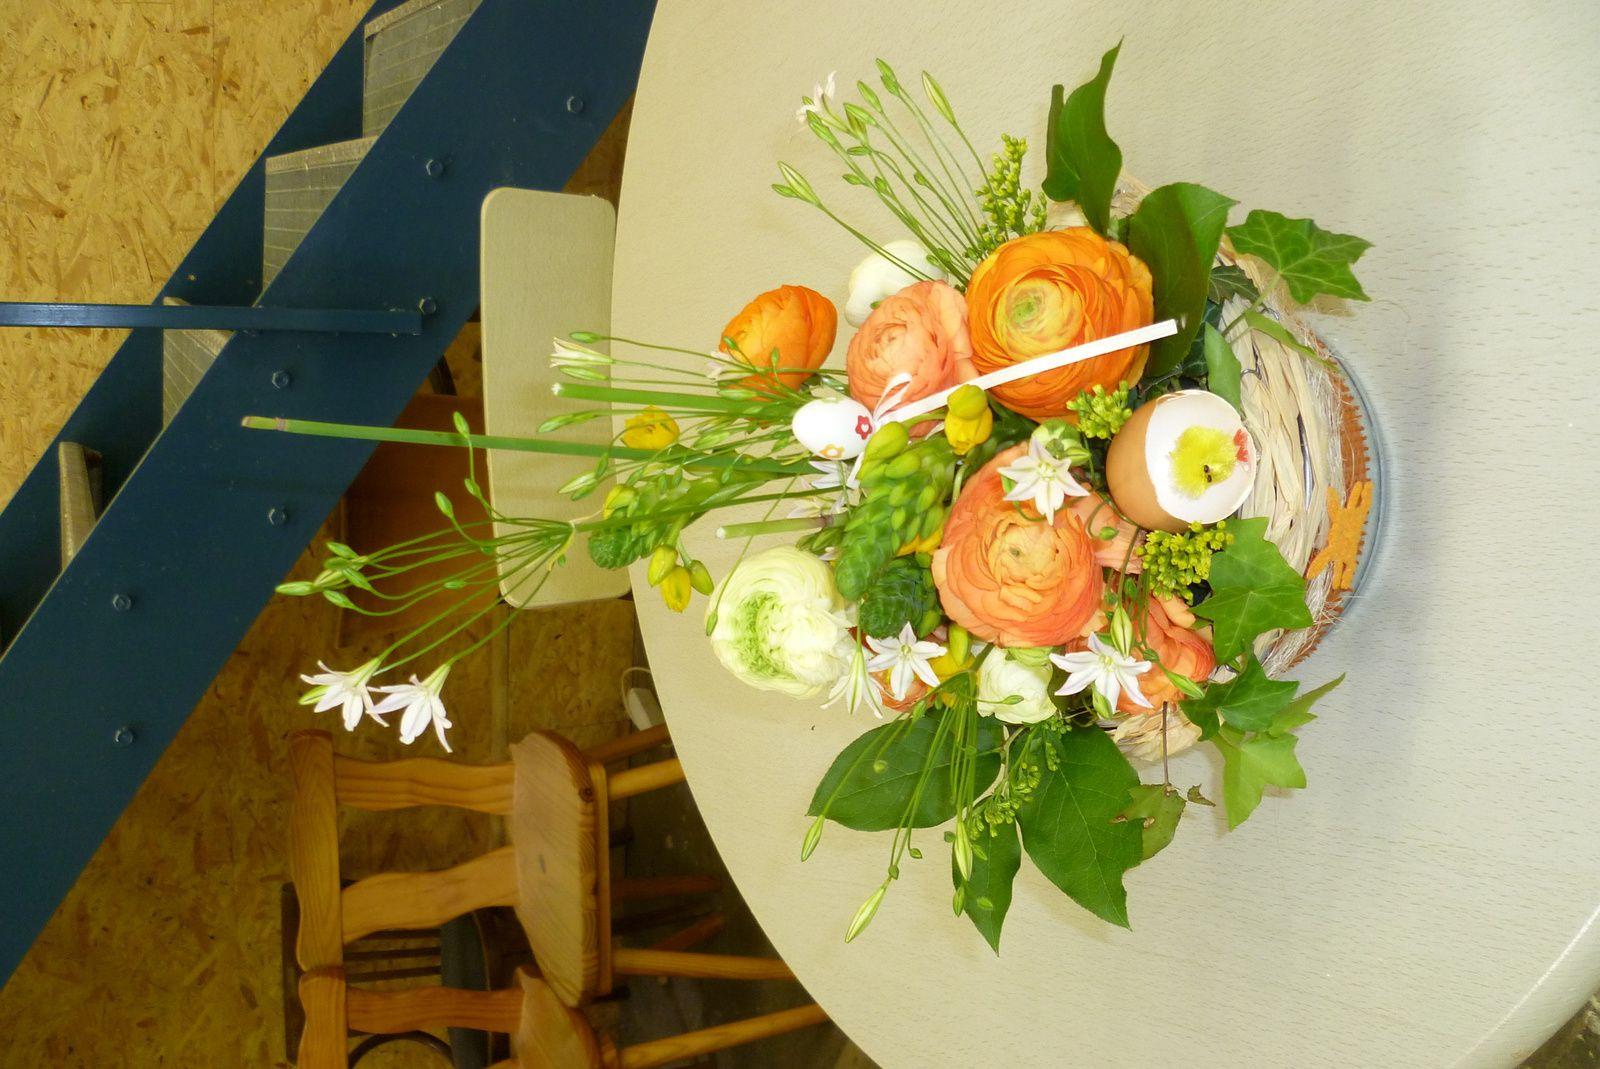 Formidable atelier Art Floral